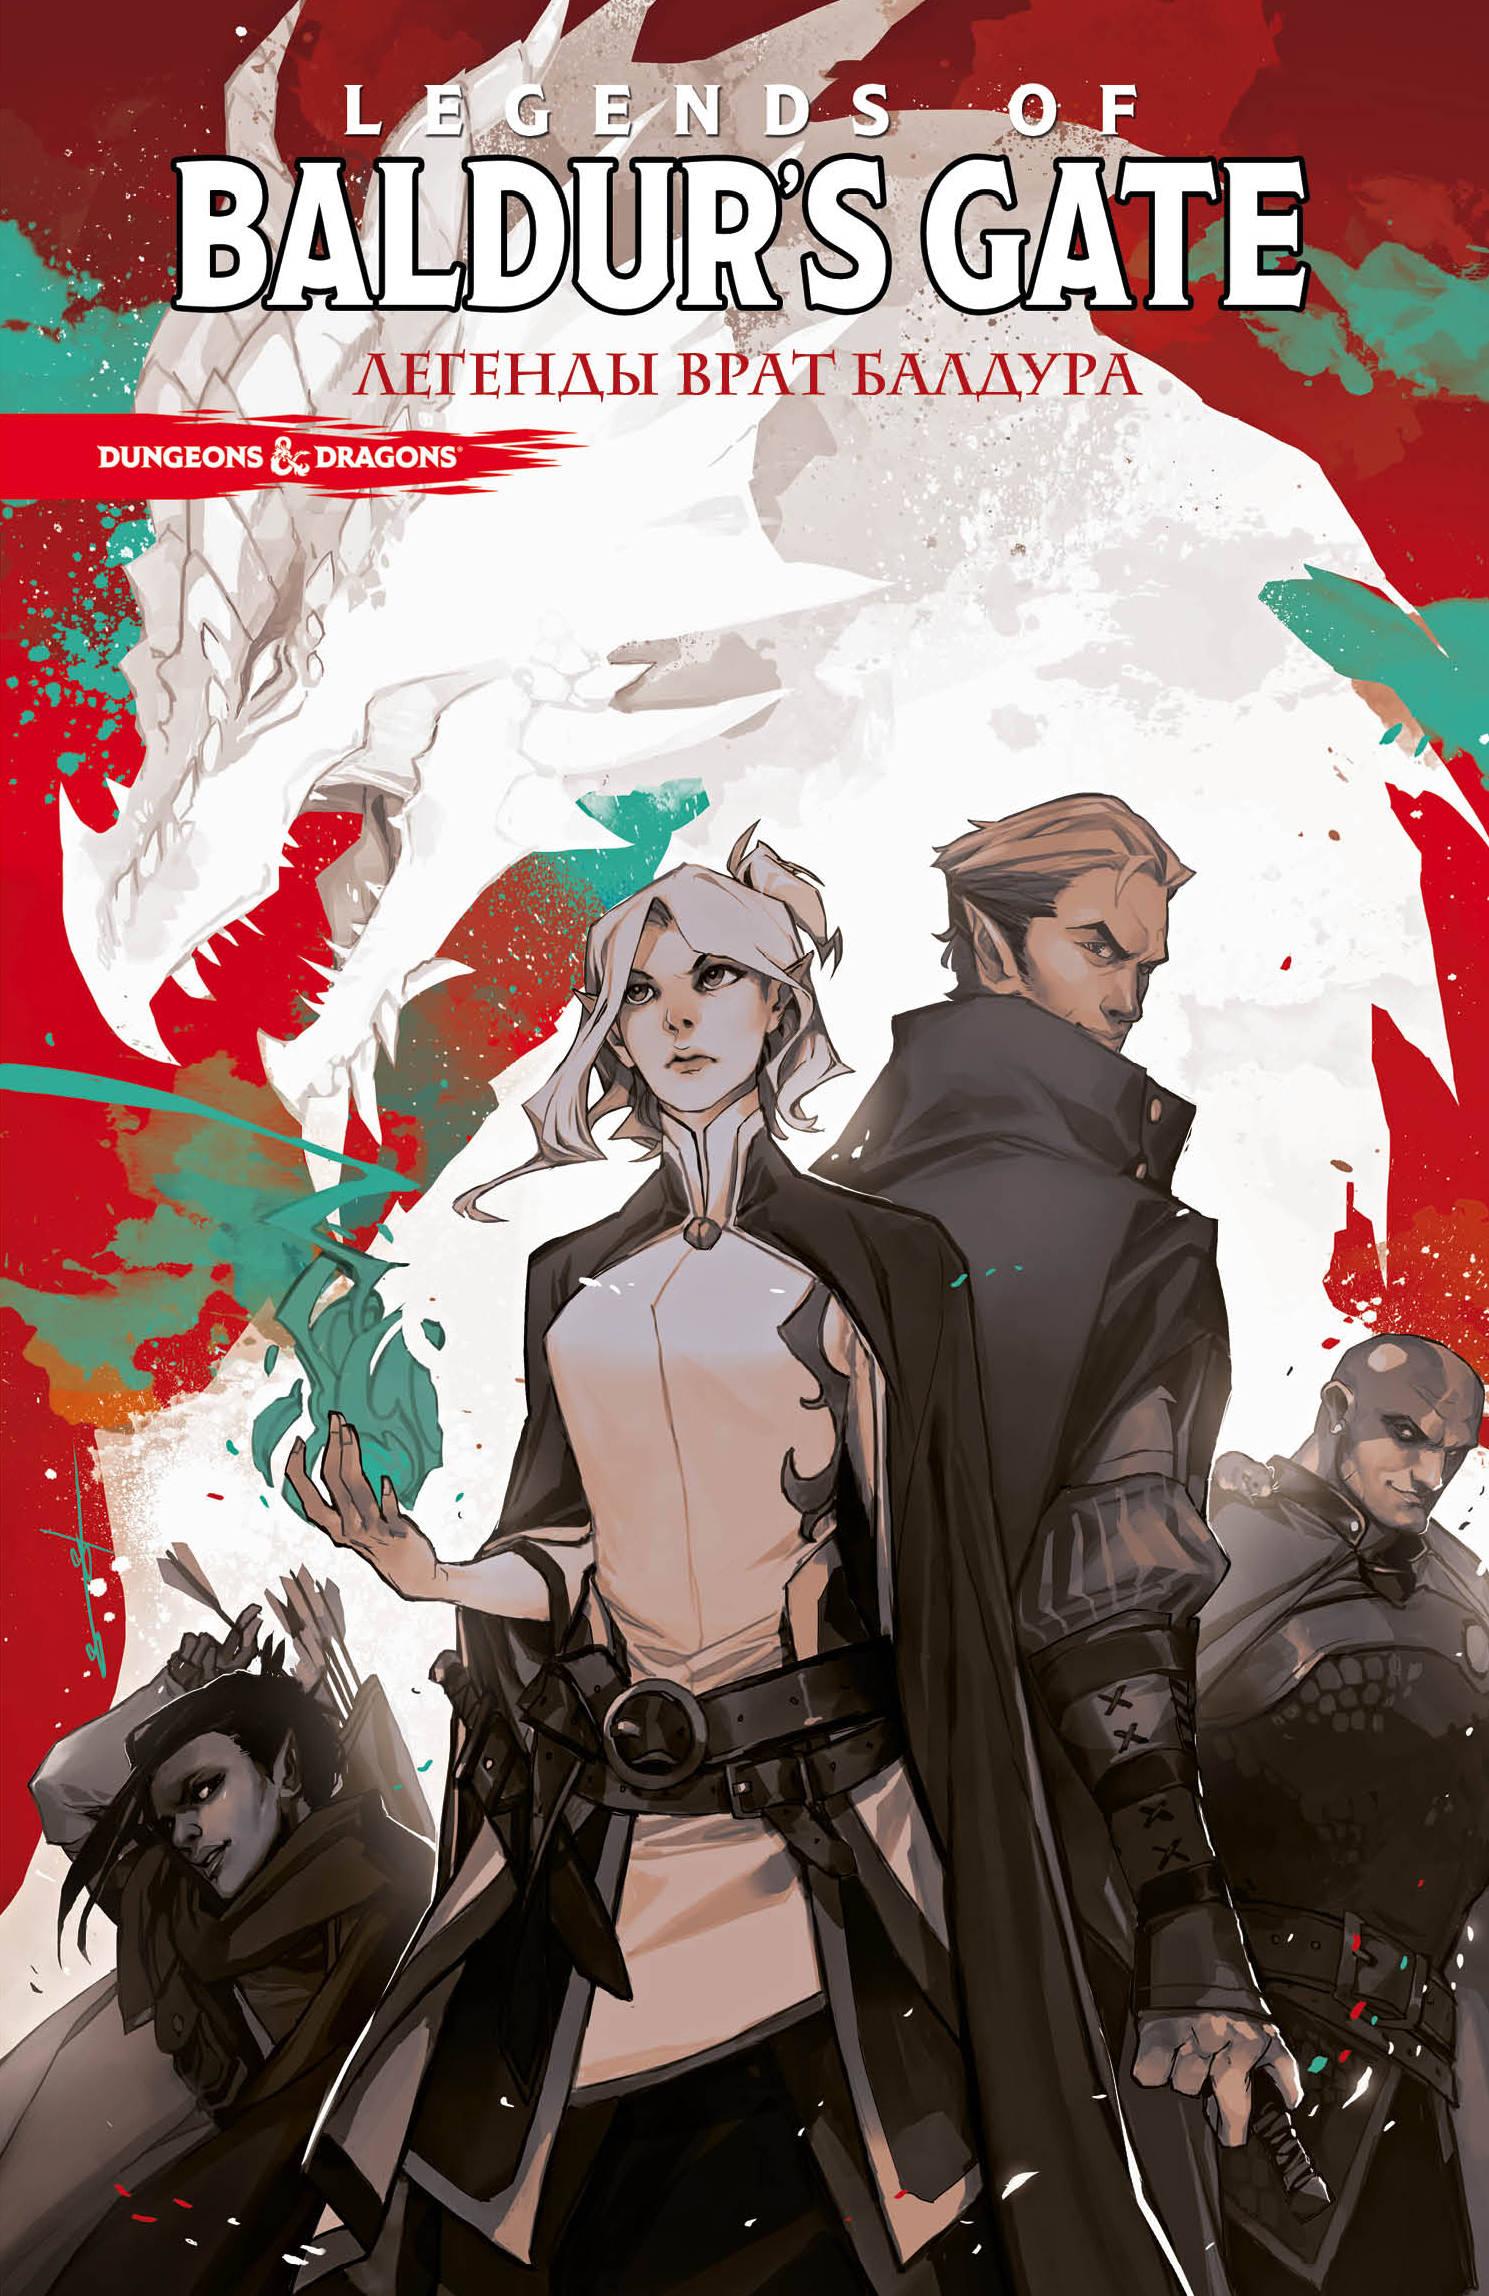 Dungeons & Dragons. Baldur's Gate. Legendy Vrat Baldura